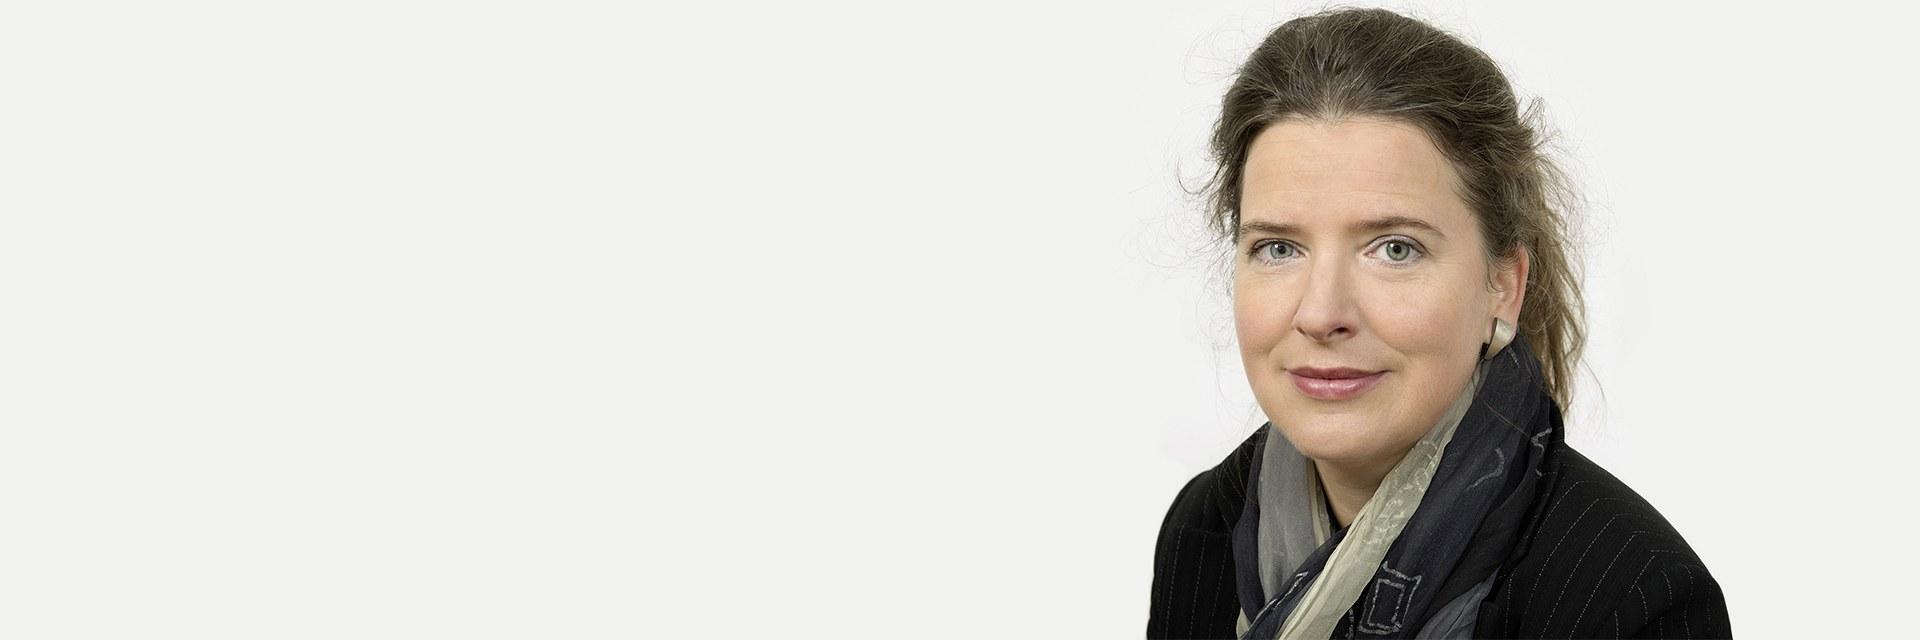 Prof. Sarah O'Brien